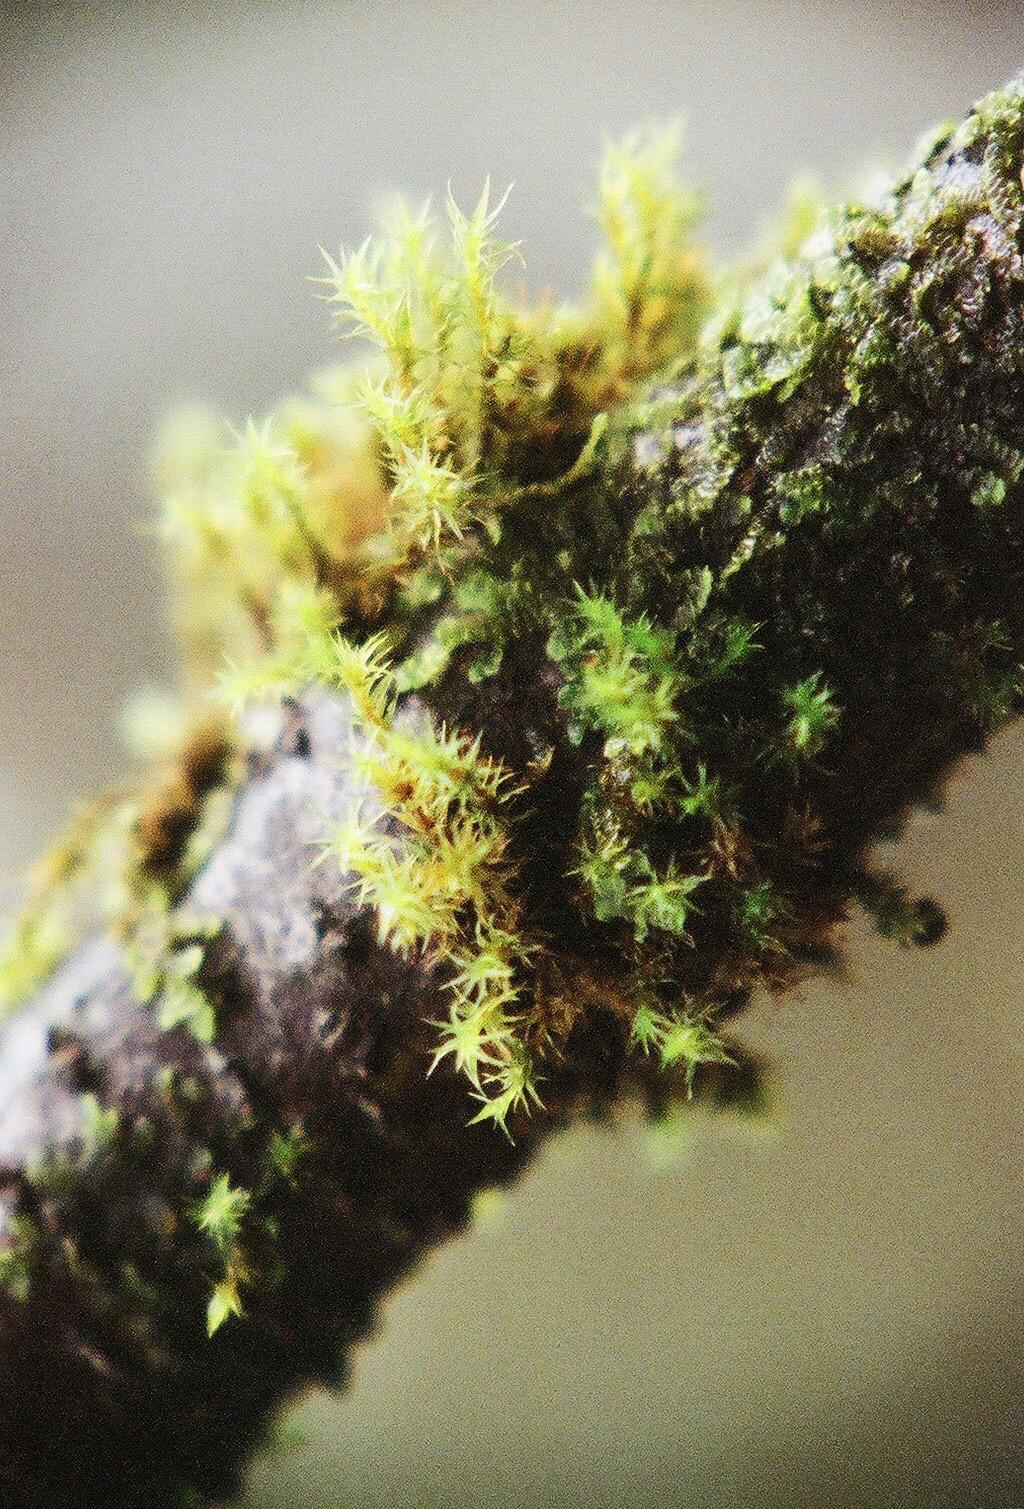 Moss on Tree 2   15.11 Fuji Pro 800